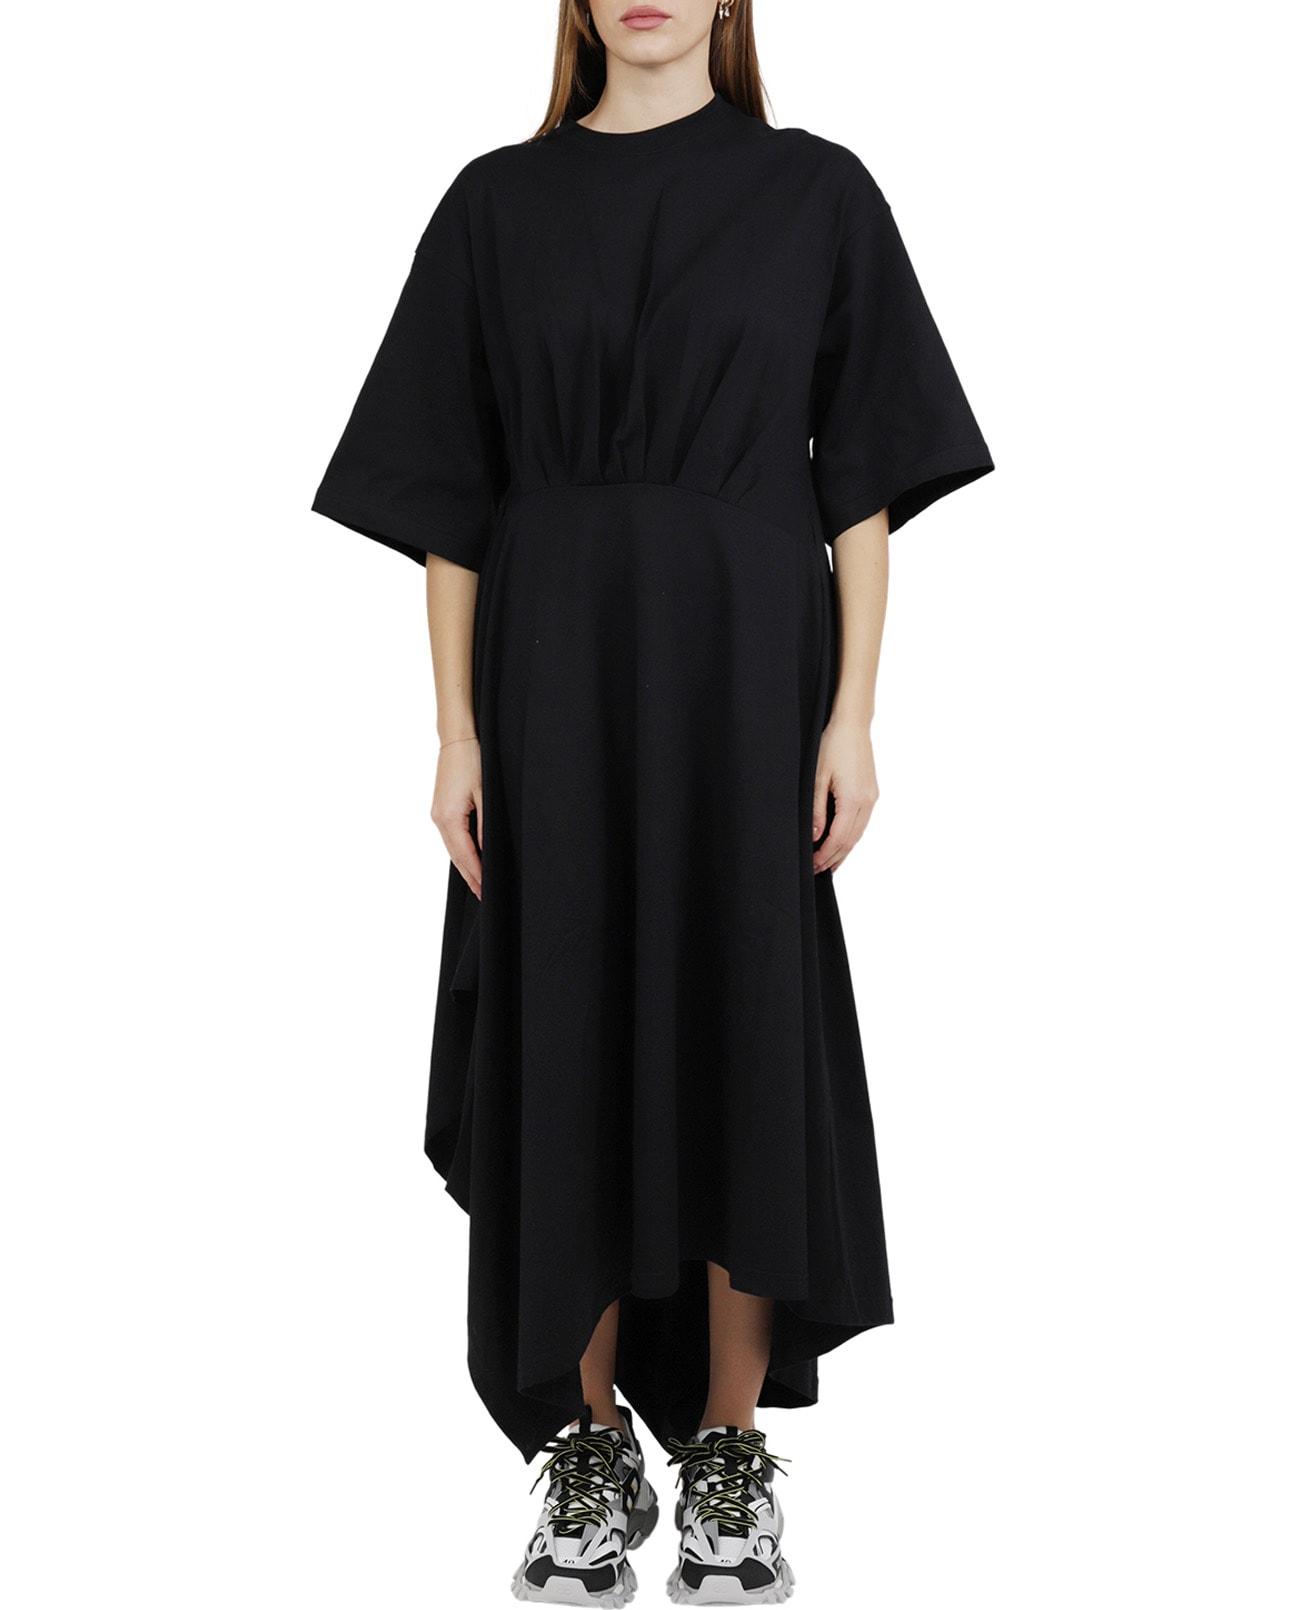 Balenciaga Black Wrap T-shirt Dress